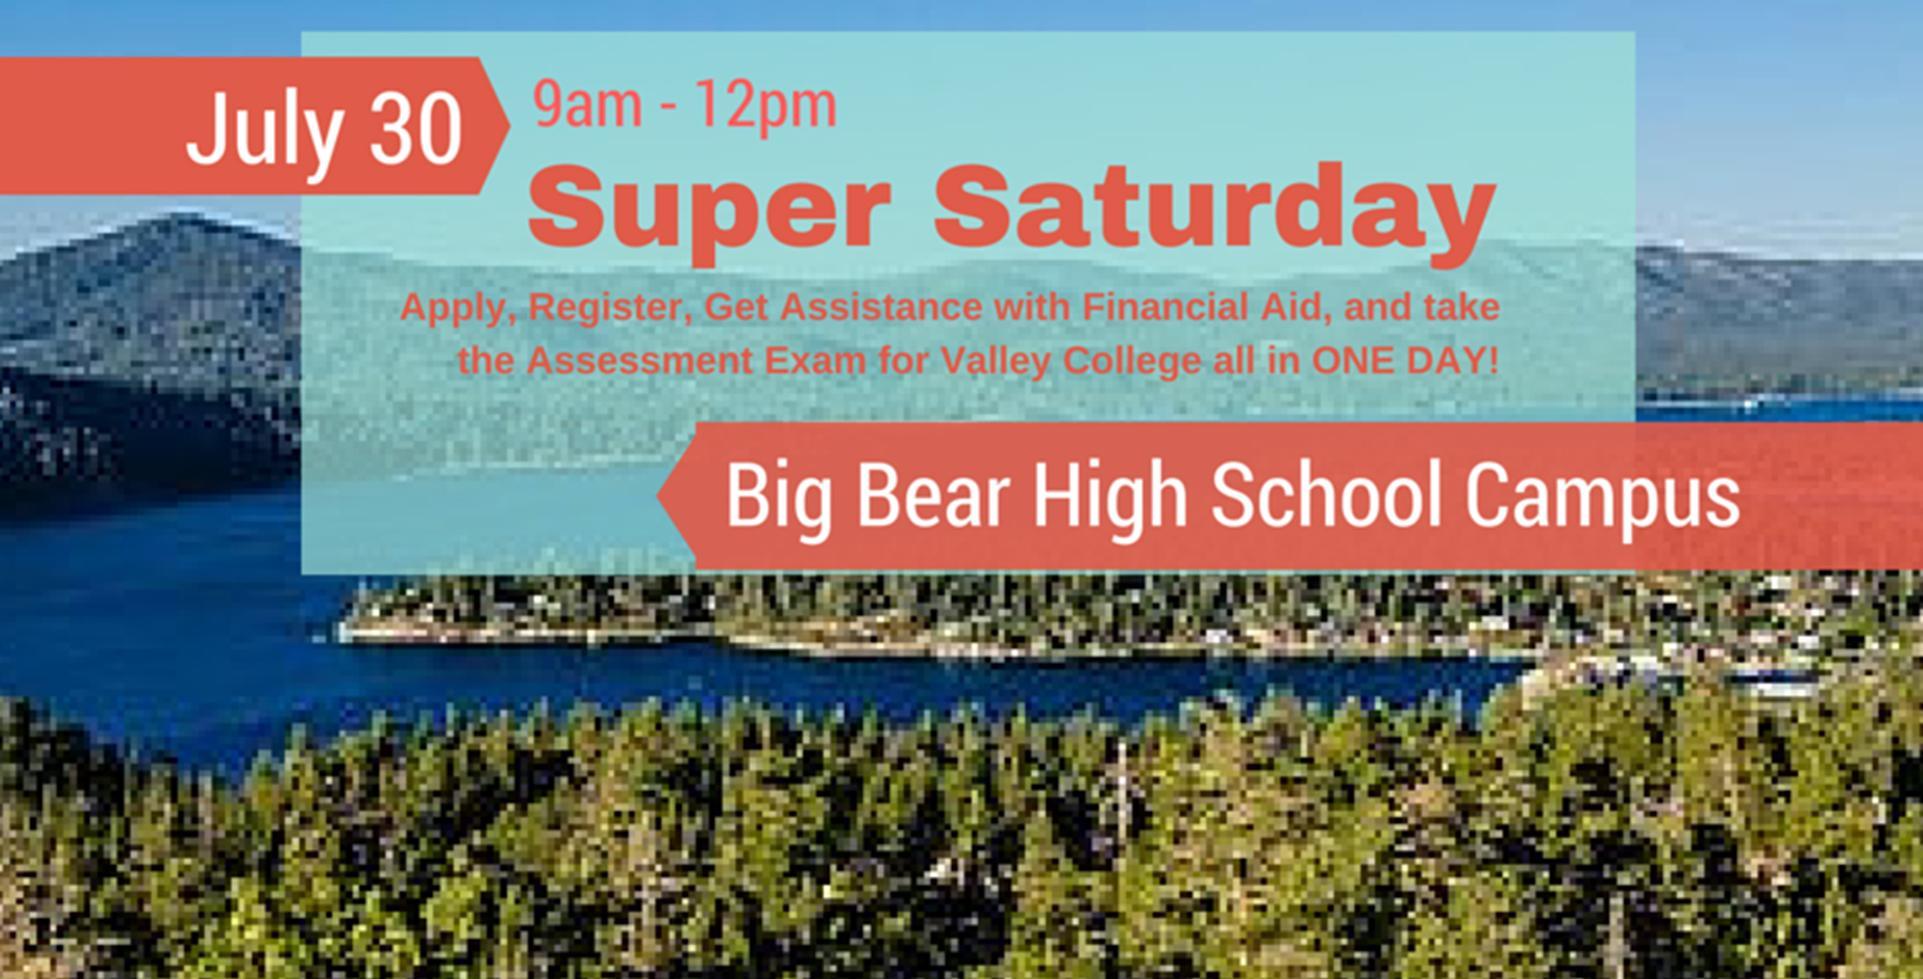 July 30 > Super Saturday in Big Bear!